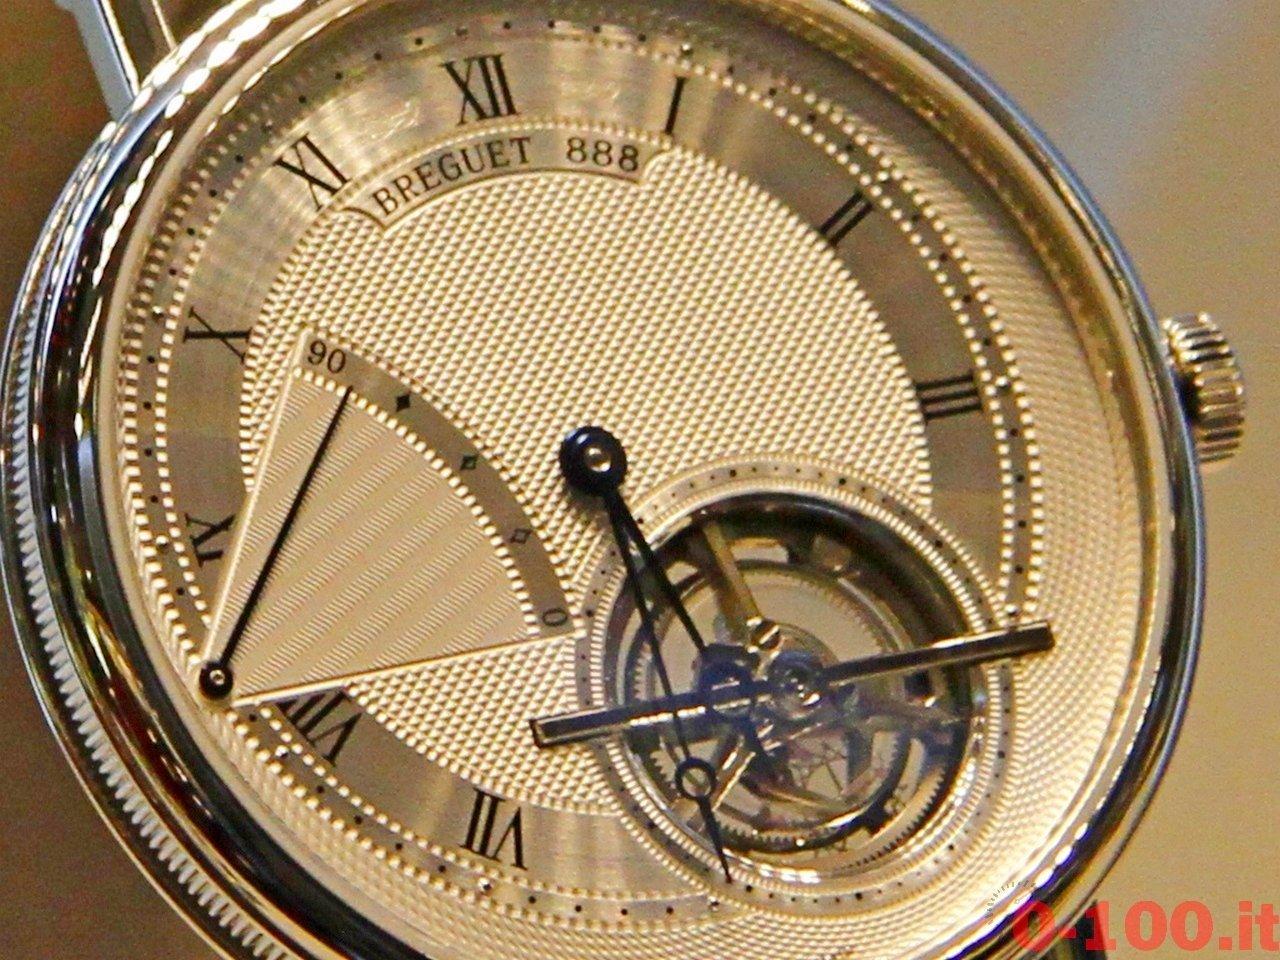 breguet-classique-grande-complication-tourbillon-extra-plat-ref-5377-baselworld-2014_0-100_5